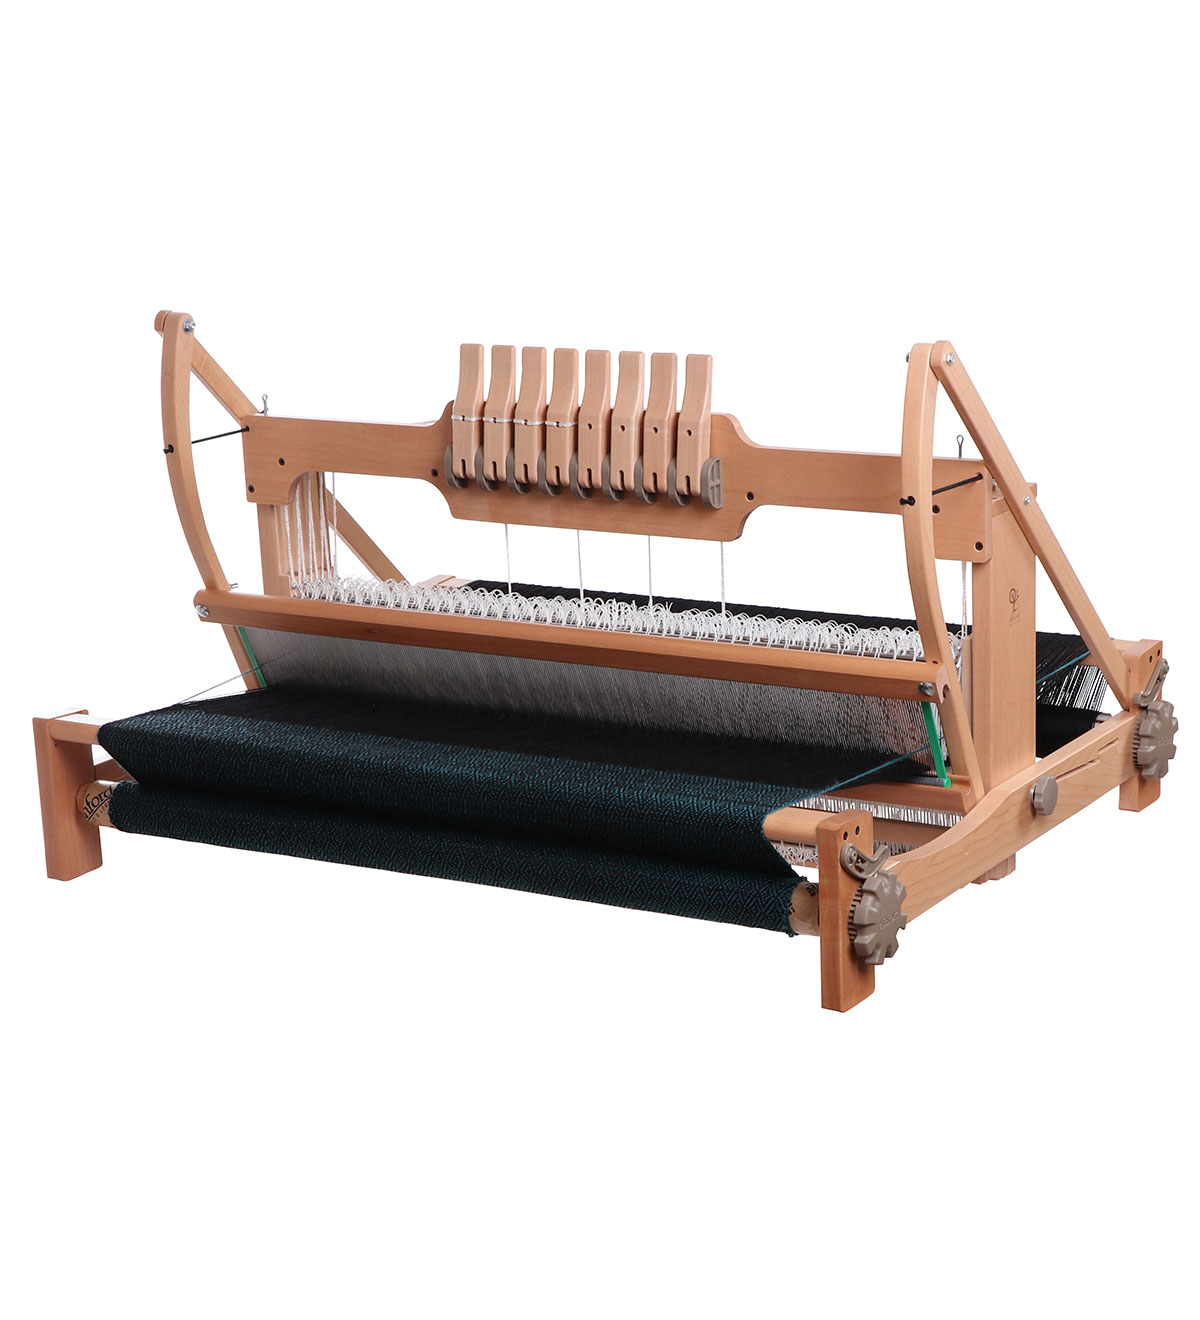 ashford handicrafts - table loom 8 shaft